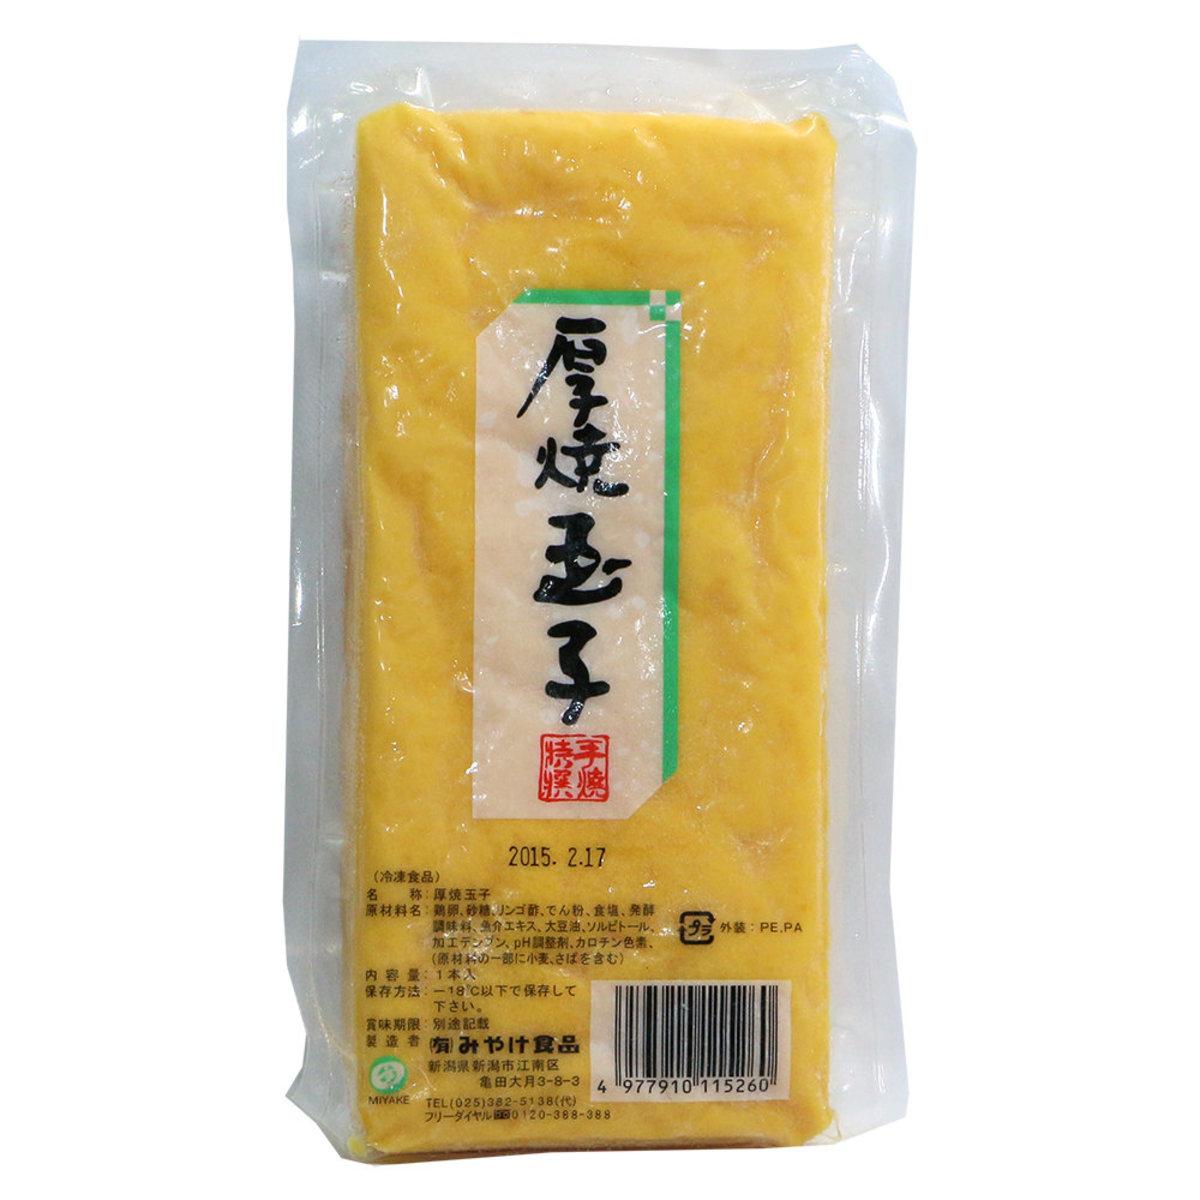 Japan Tamago Atsu Yaki (Miyake) 500g